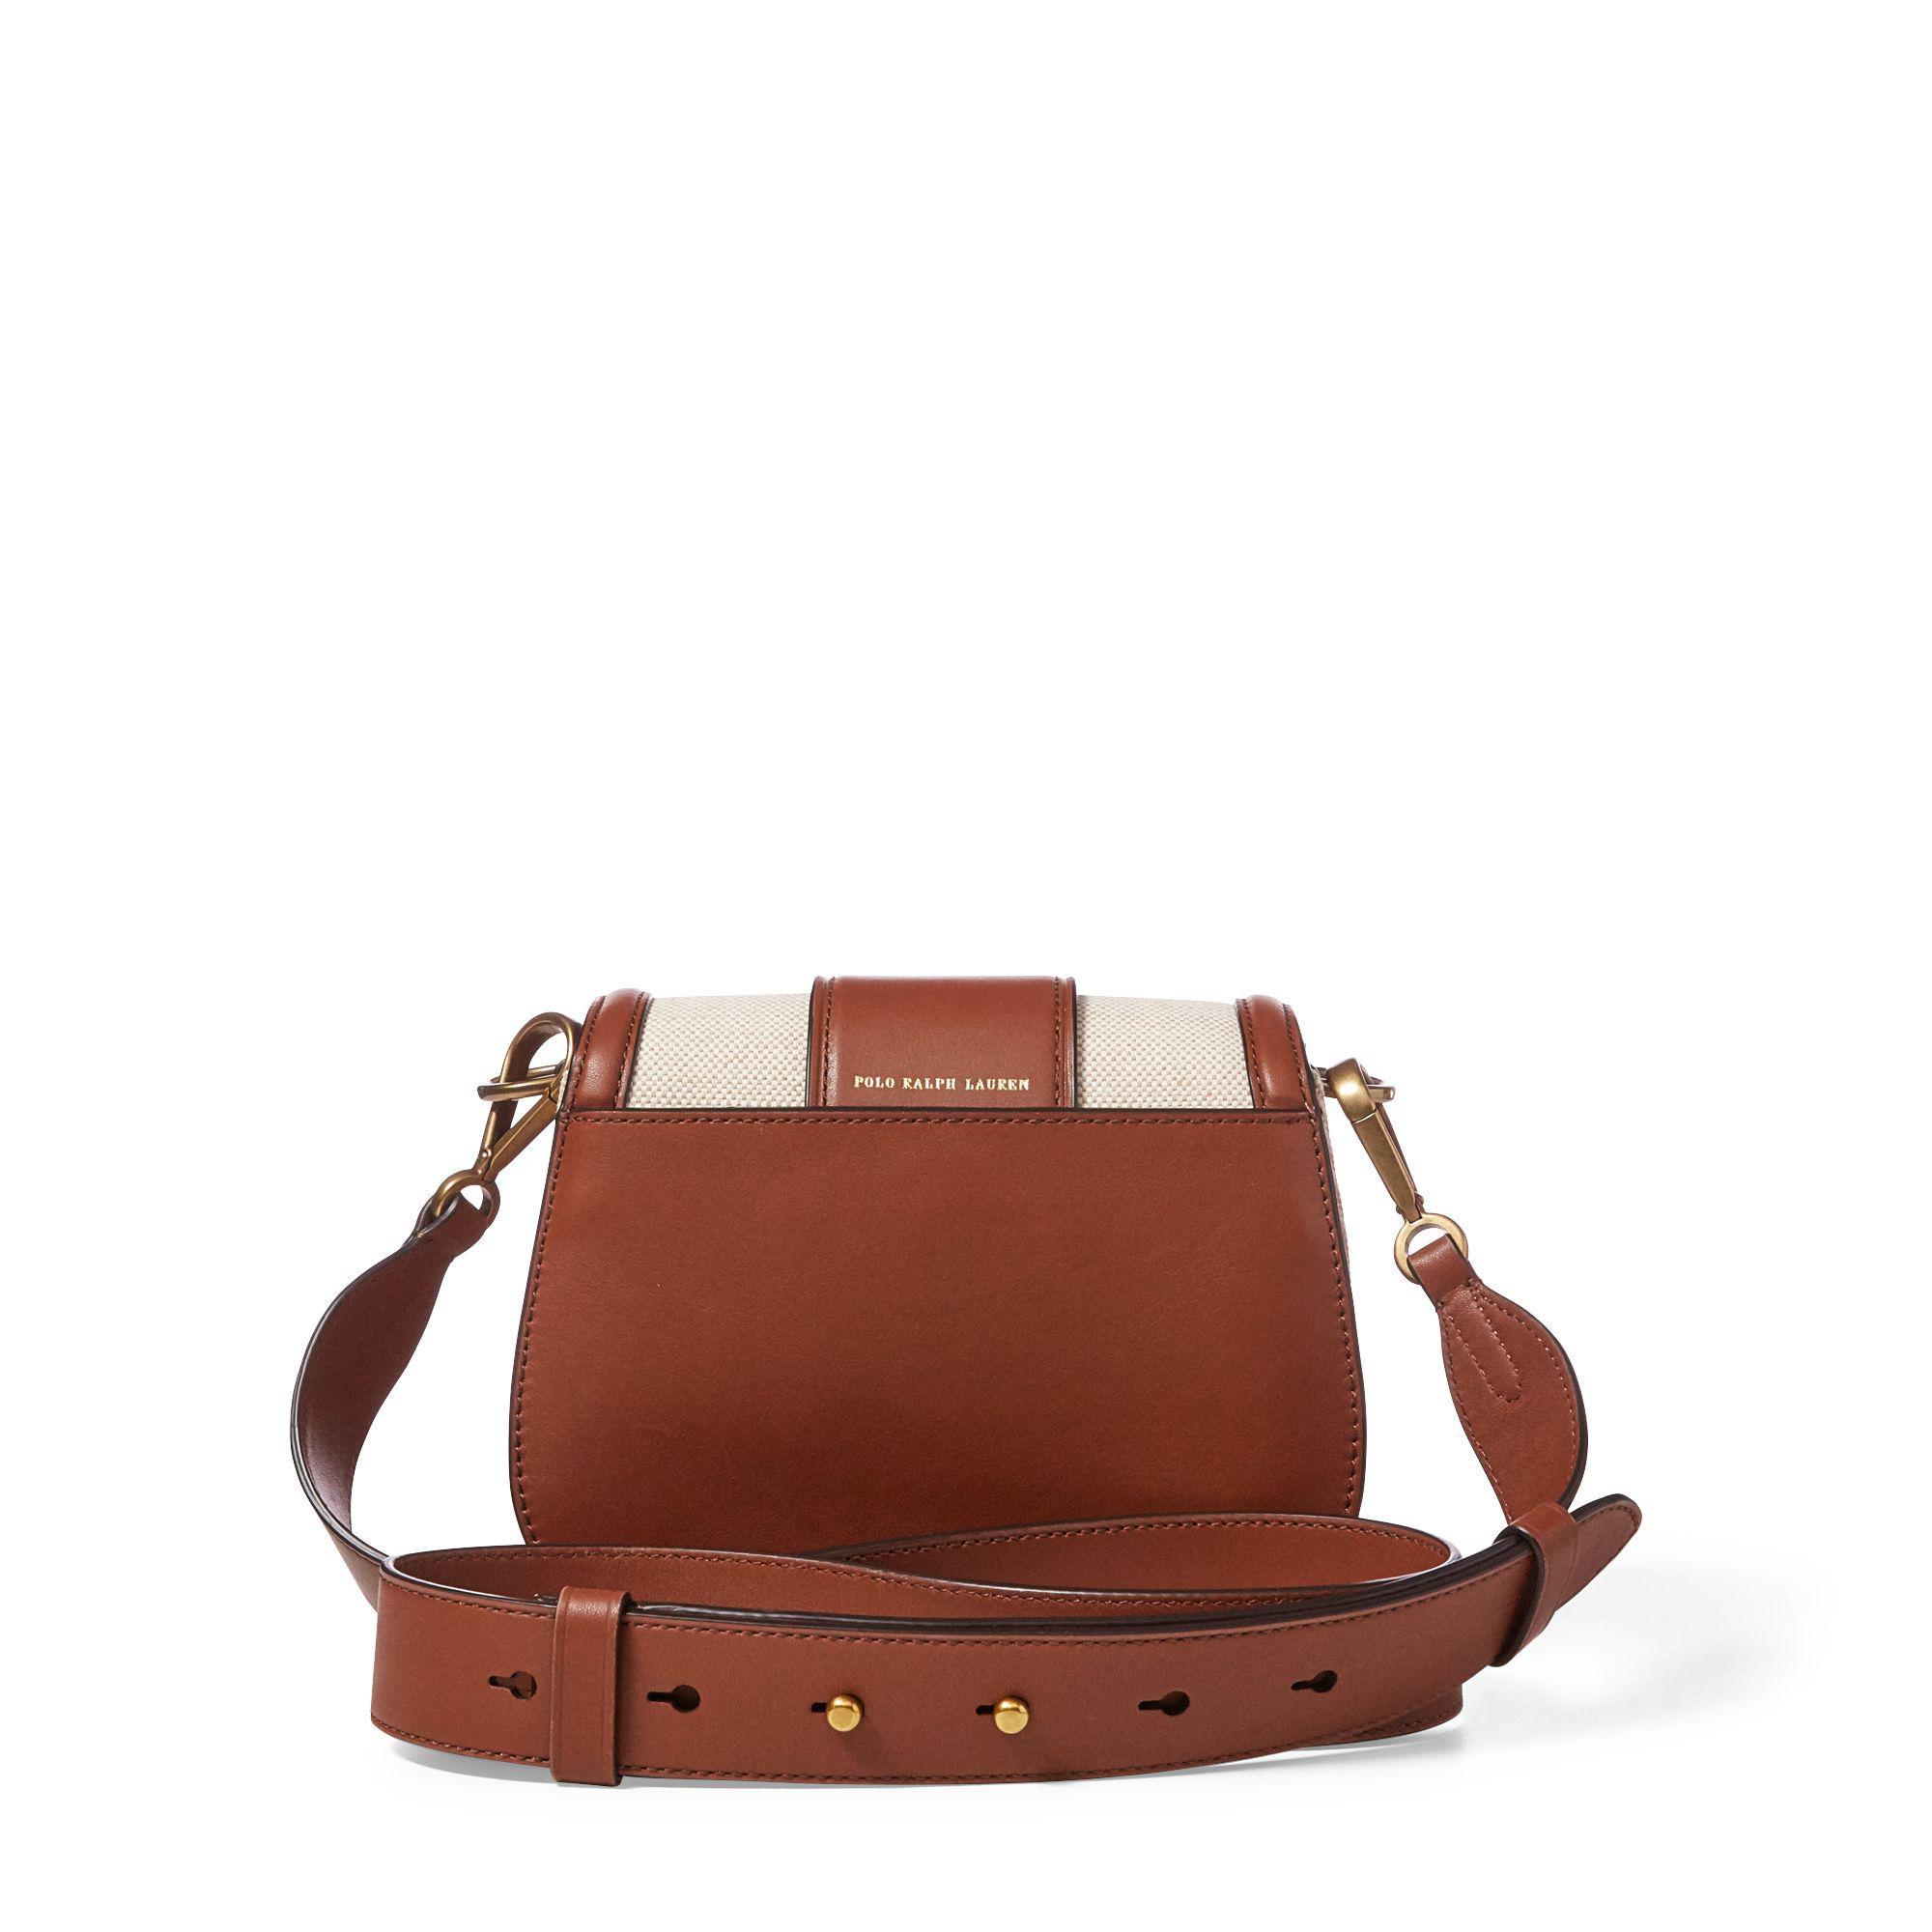 Polo Ralph Lauren Wood-buckle Lennox Bag in Brown - Lyst 82f97249c9